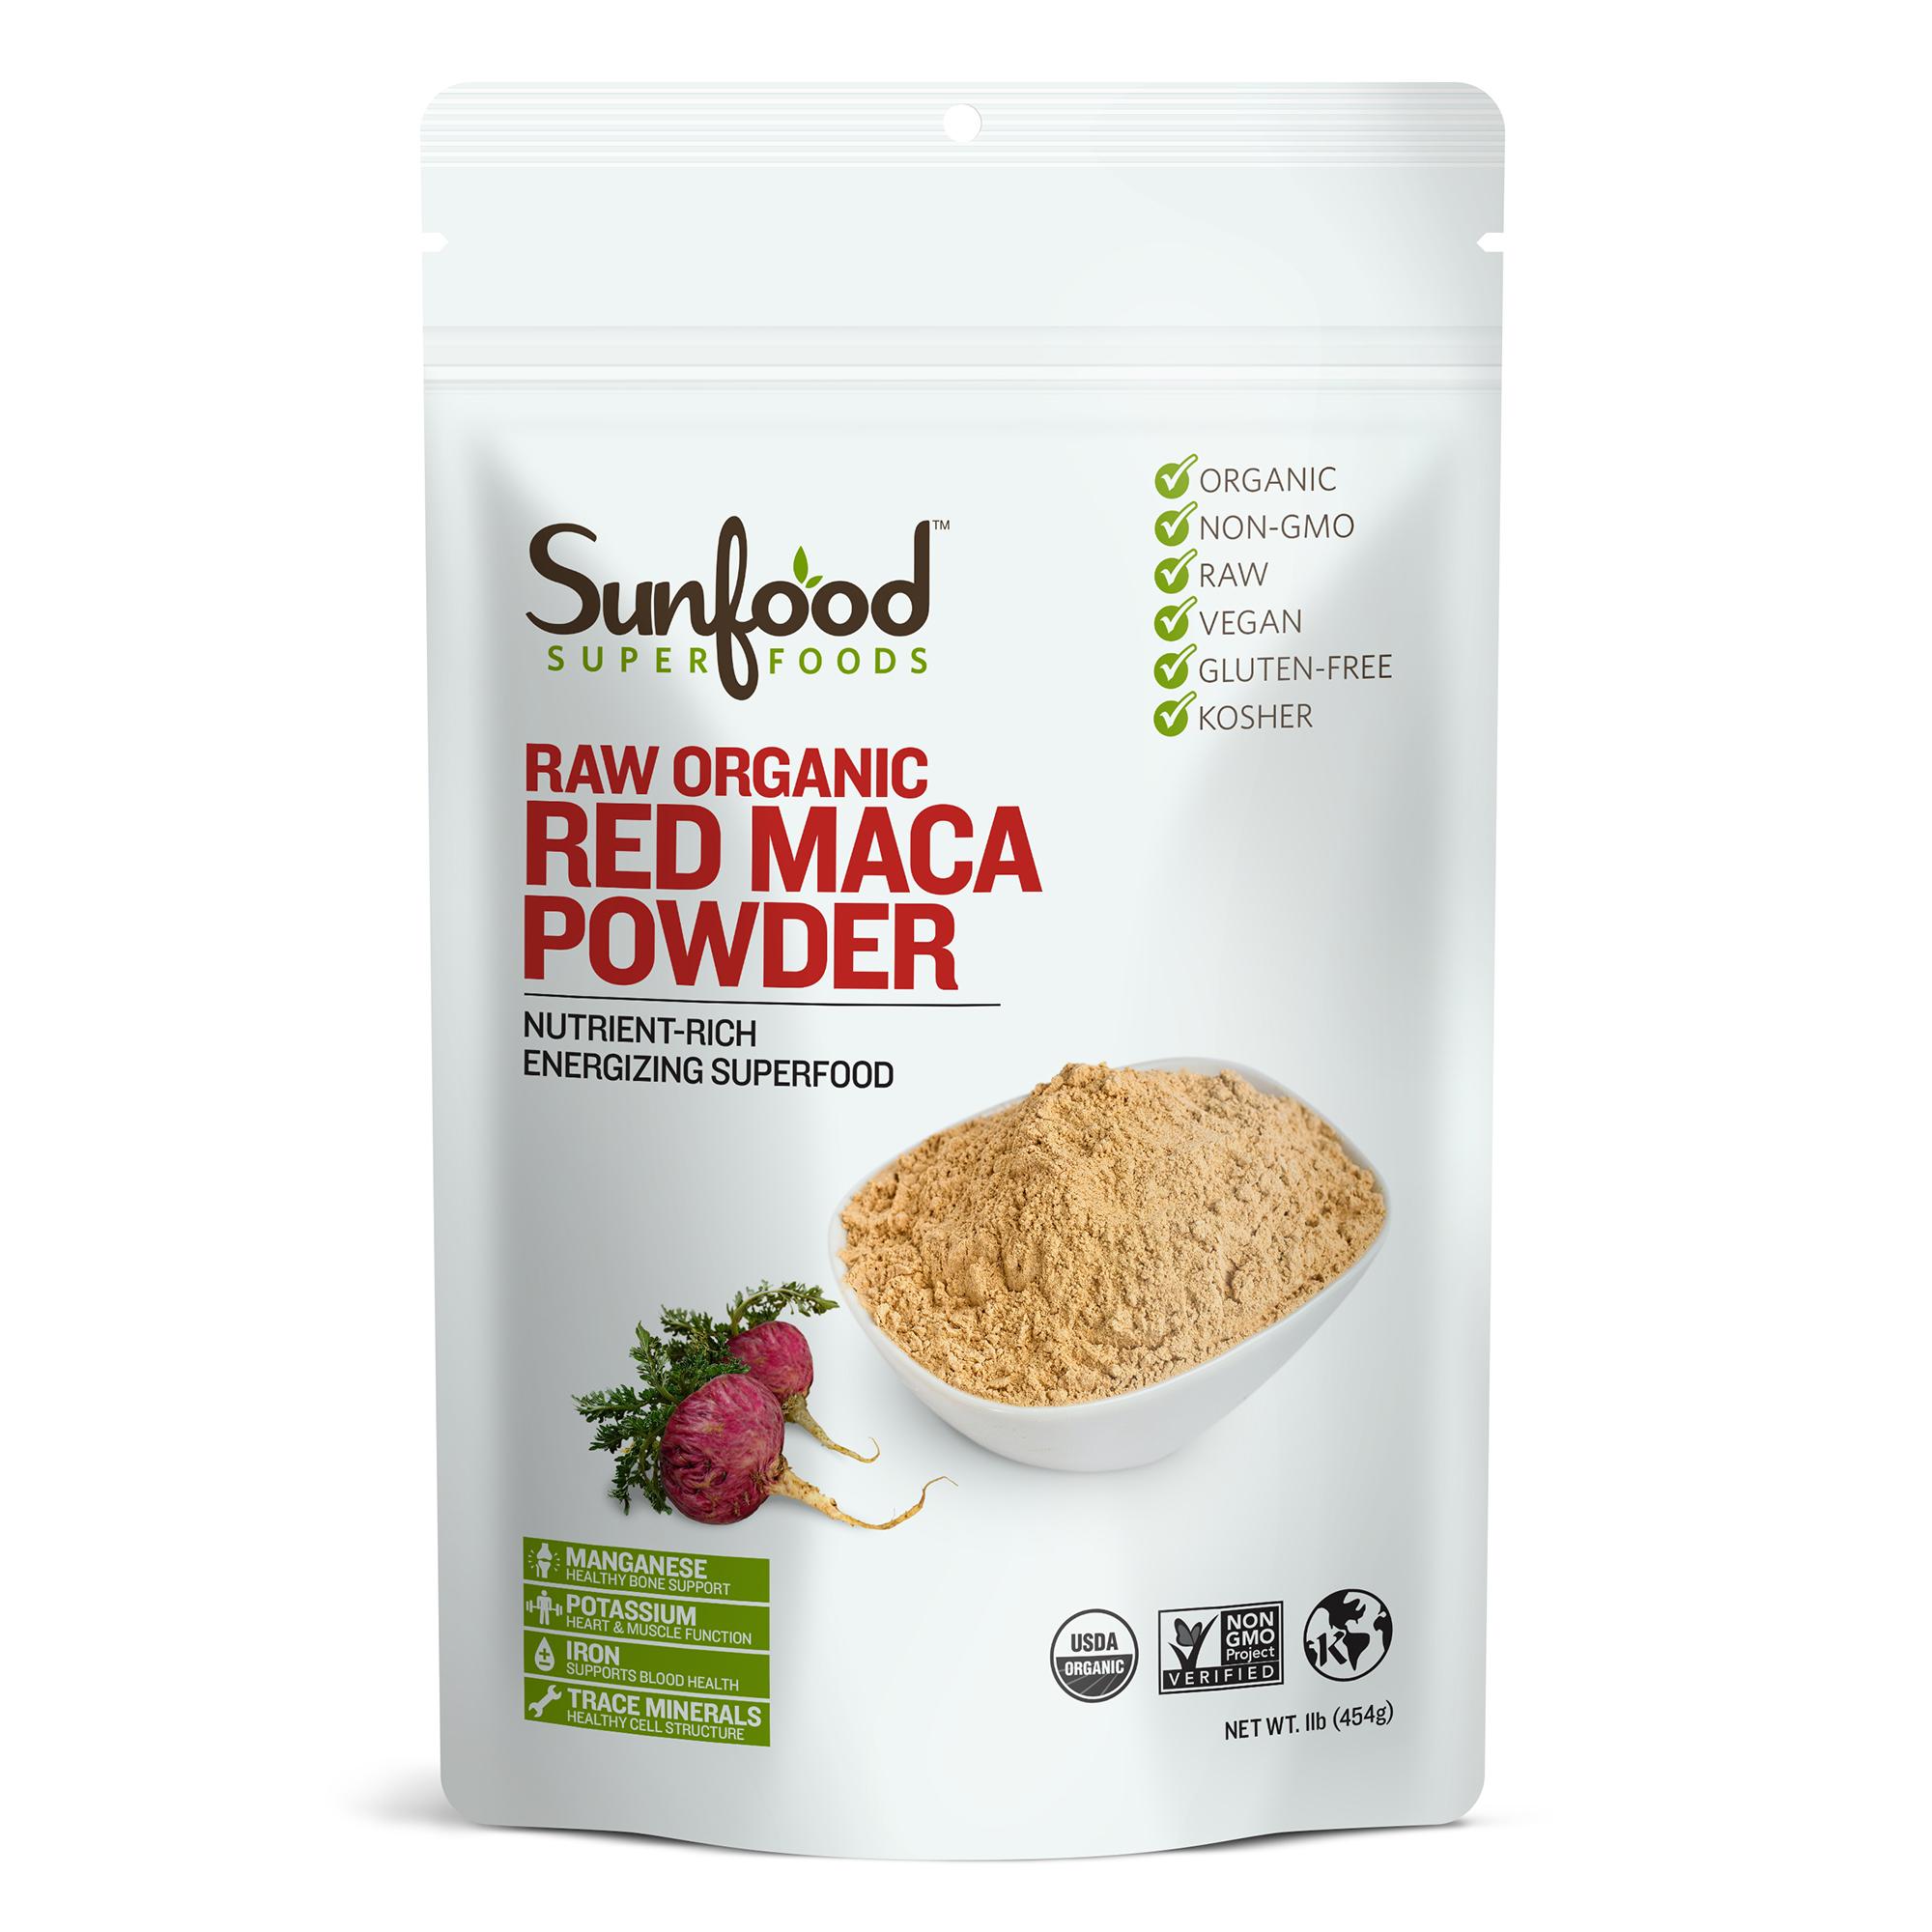 Sunfood Superfoods Organic Red Maca Powder, 1.0 Lb